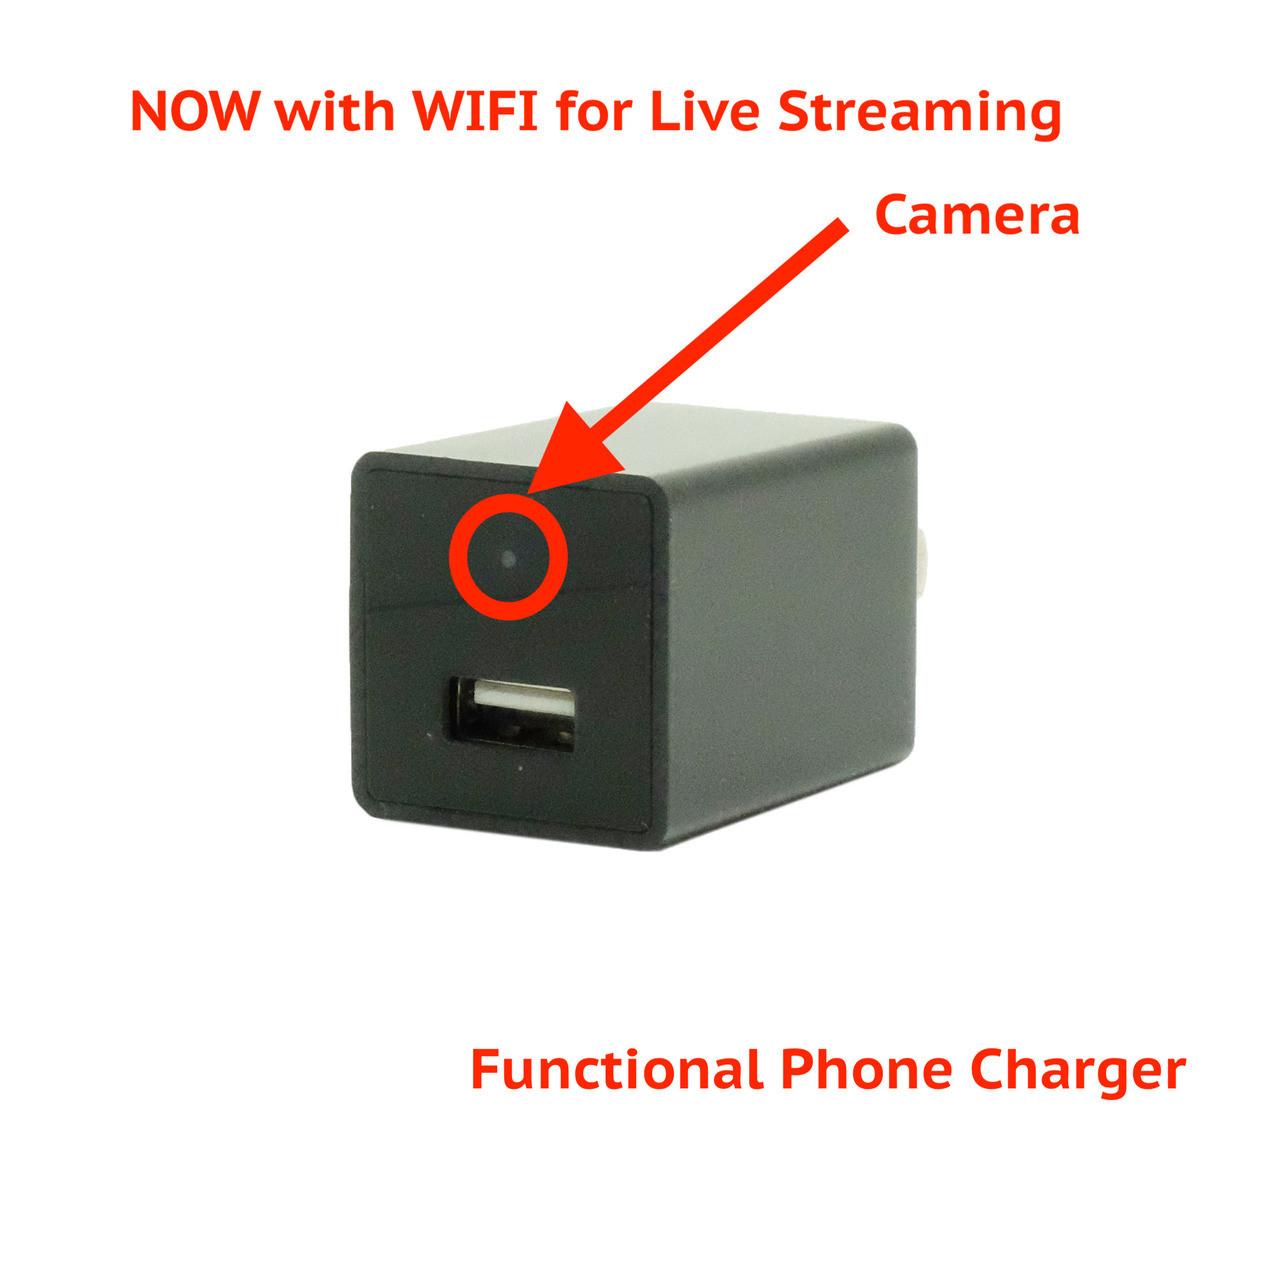 Spy Infrared Wireless Camera Built Into Ordinary Phone USB